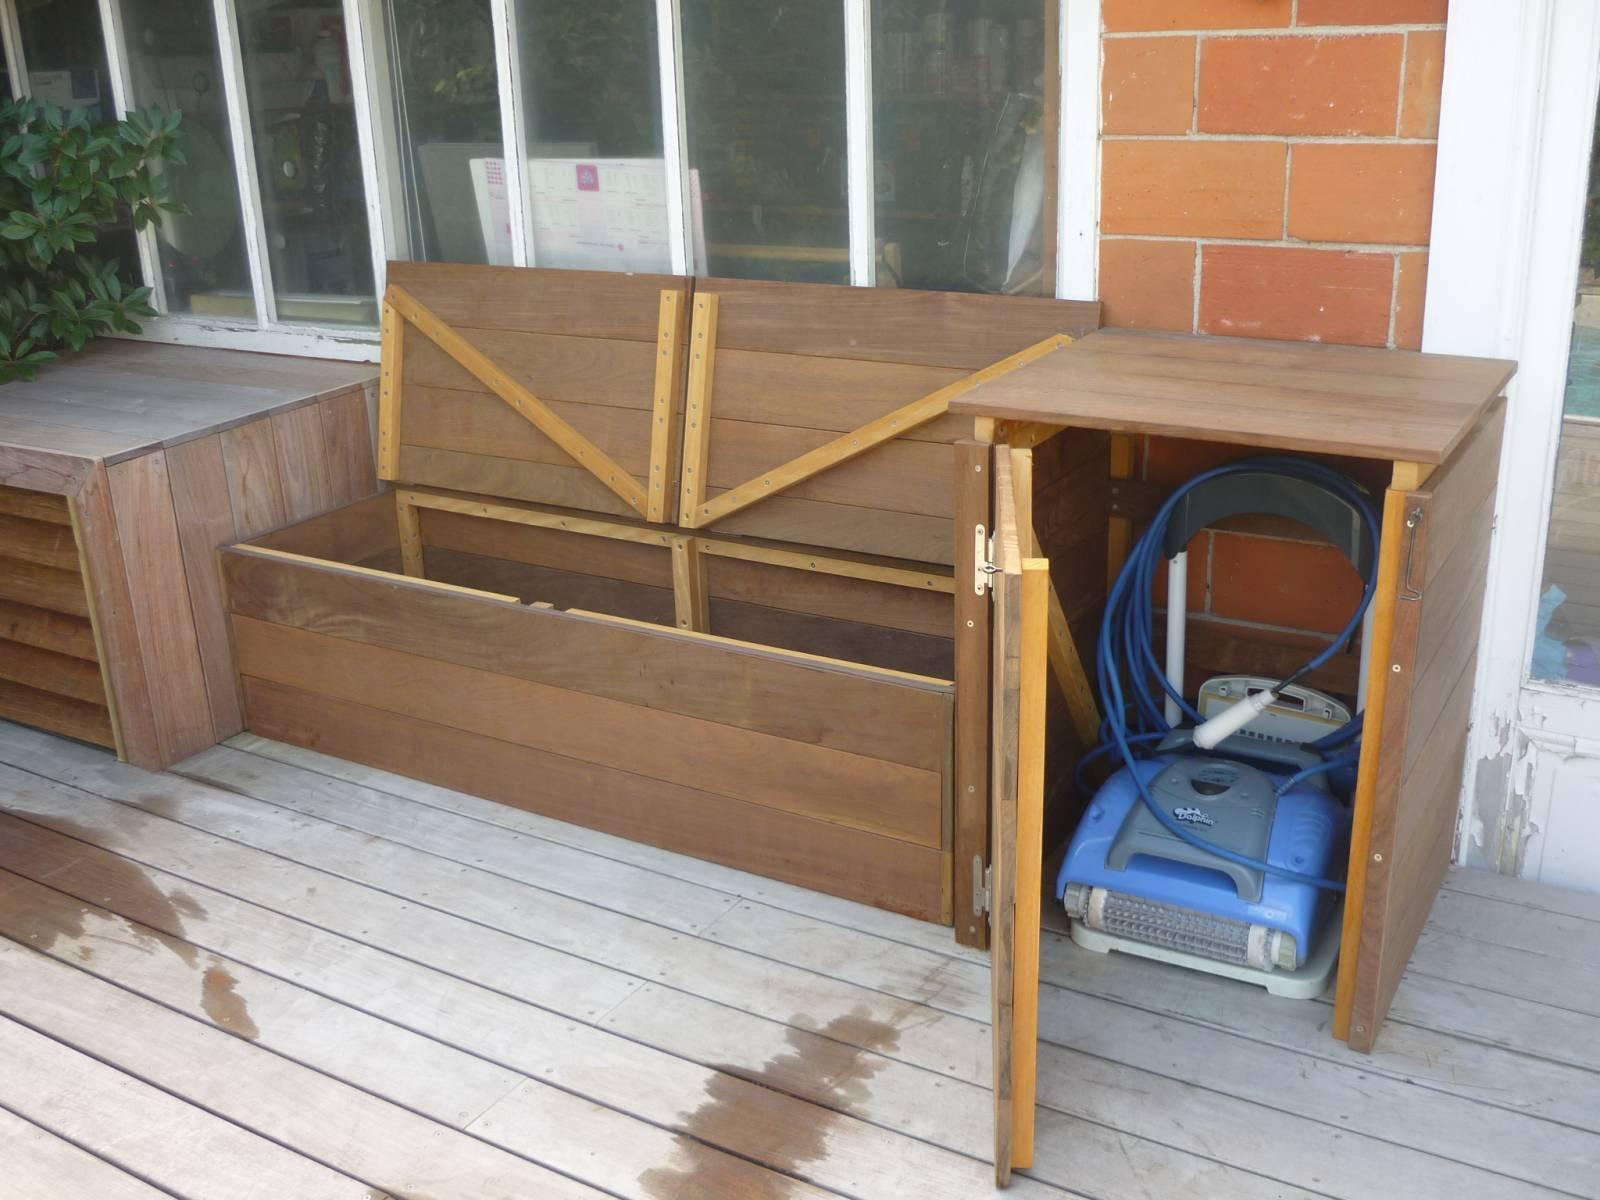 Mobilier bois a cestas deck caillebotis for Mobilier bois